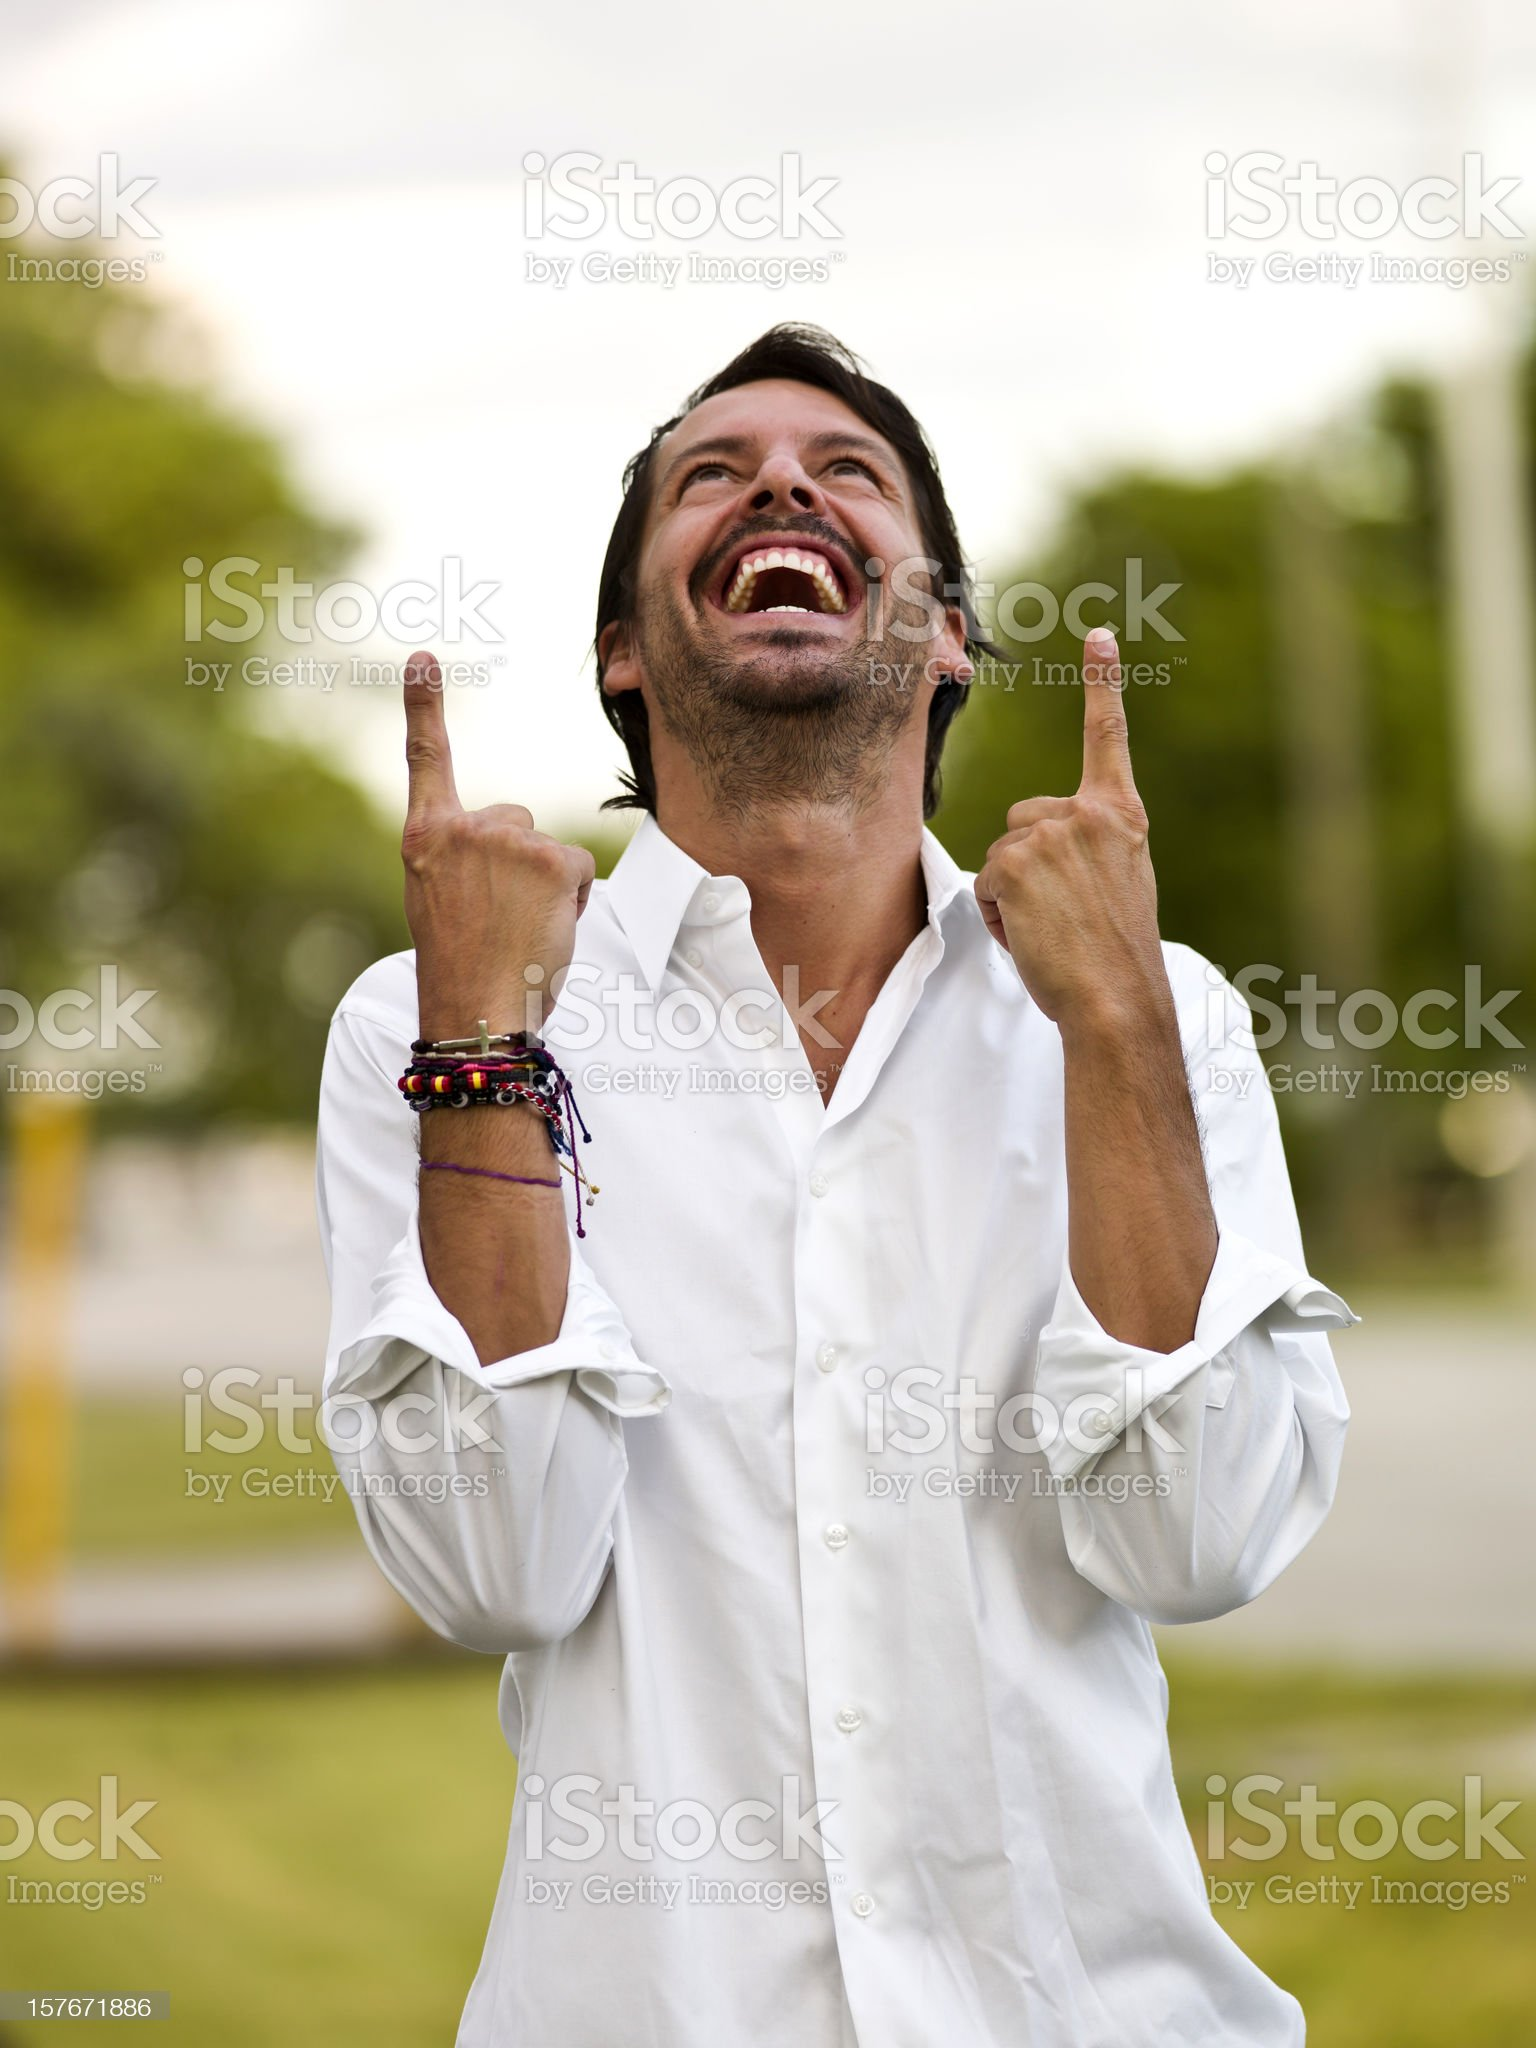 Hispanic Man pointing up royalty-free stock photo